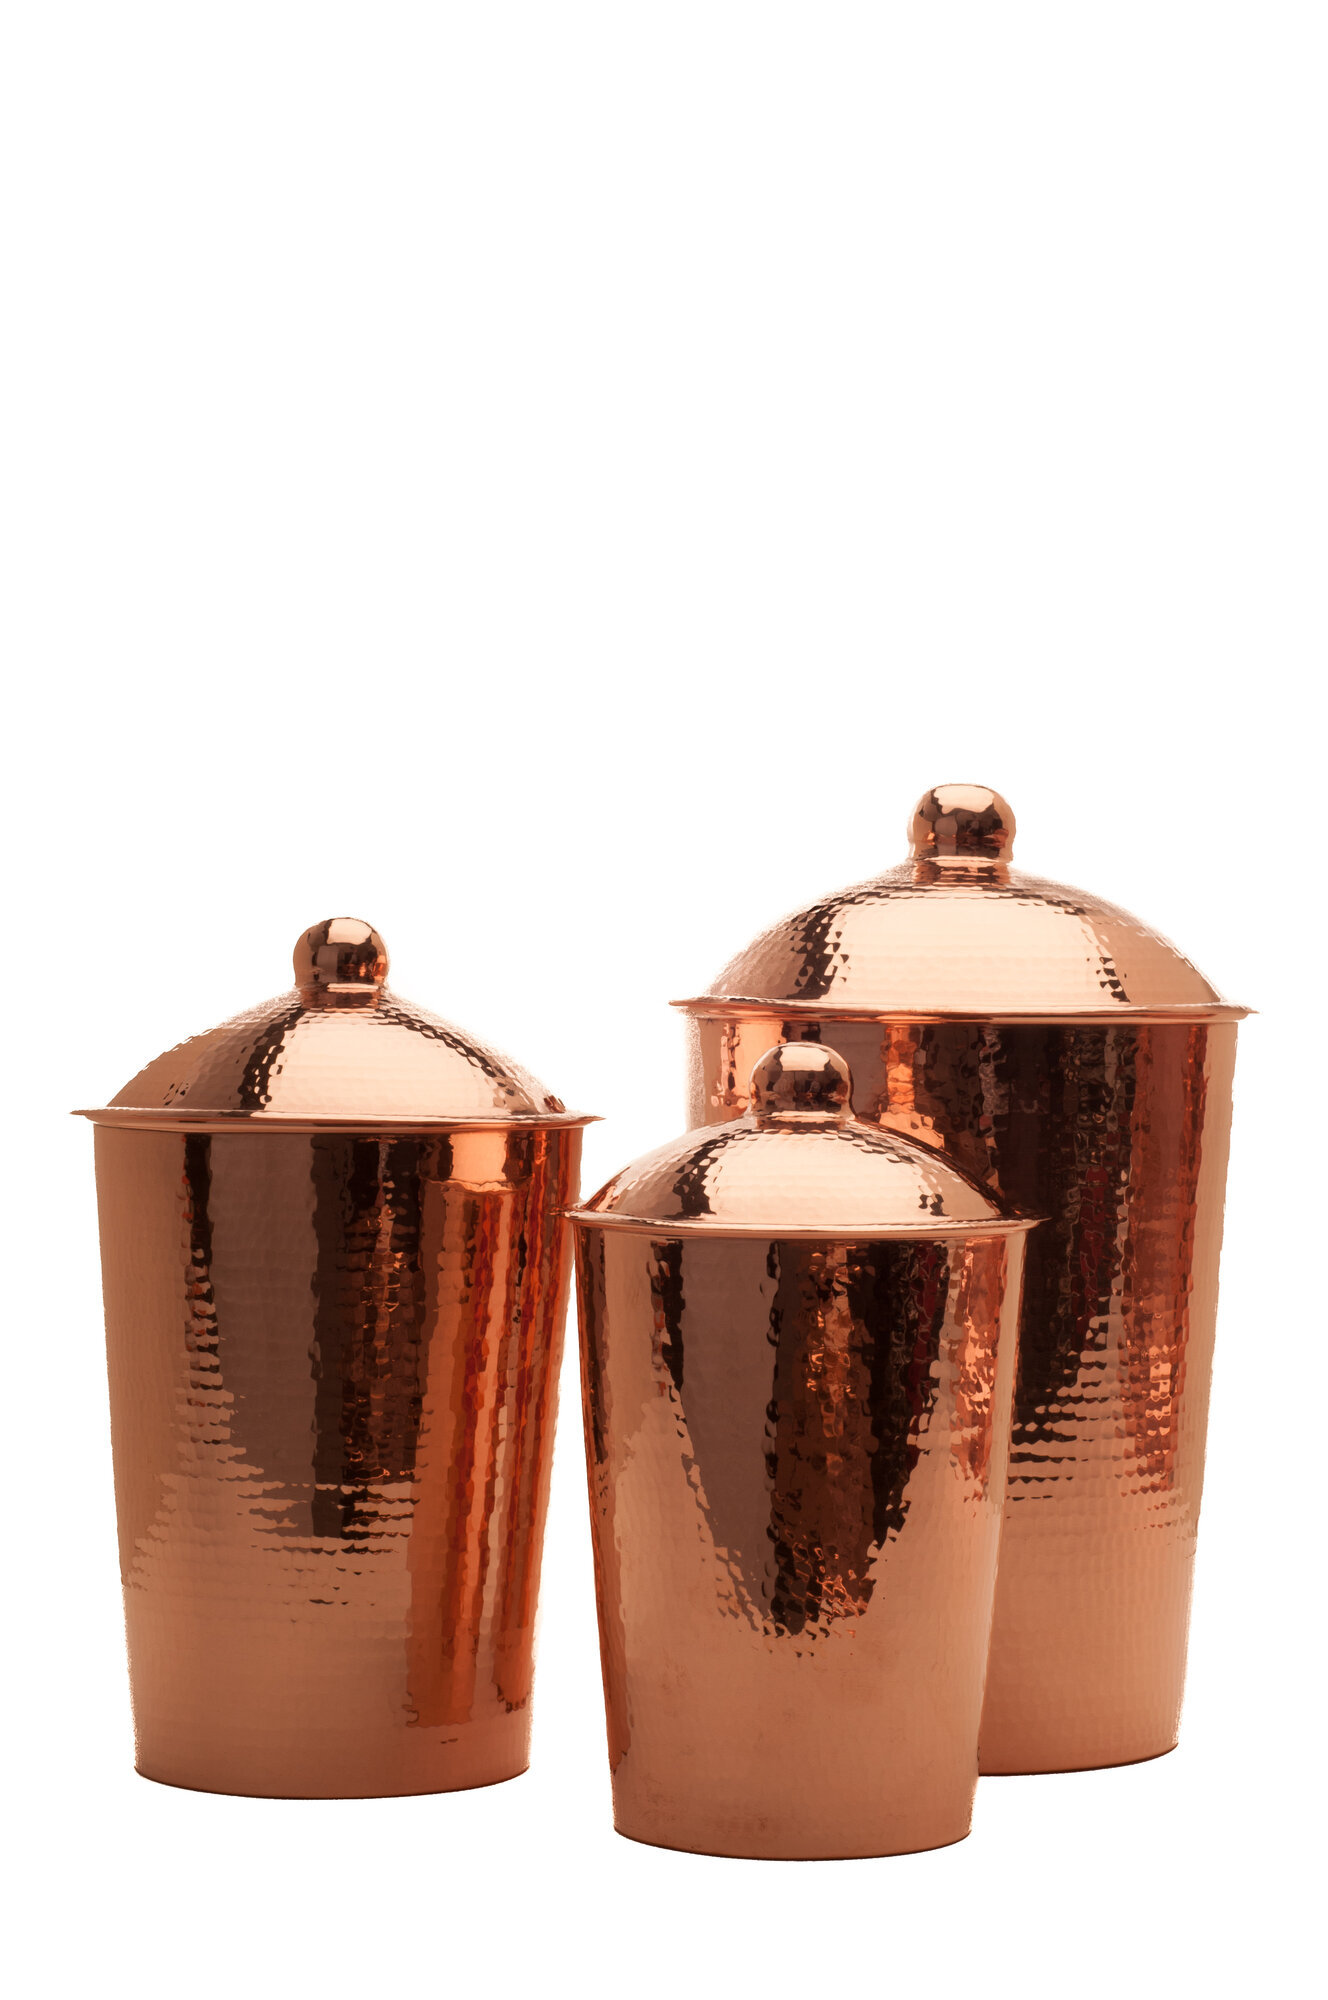 Sertodo copper kumran 3 piece kitchen canister set ebay for Kitchen set ebay